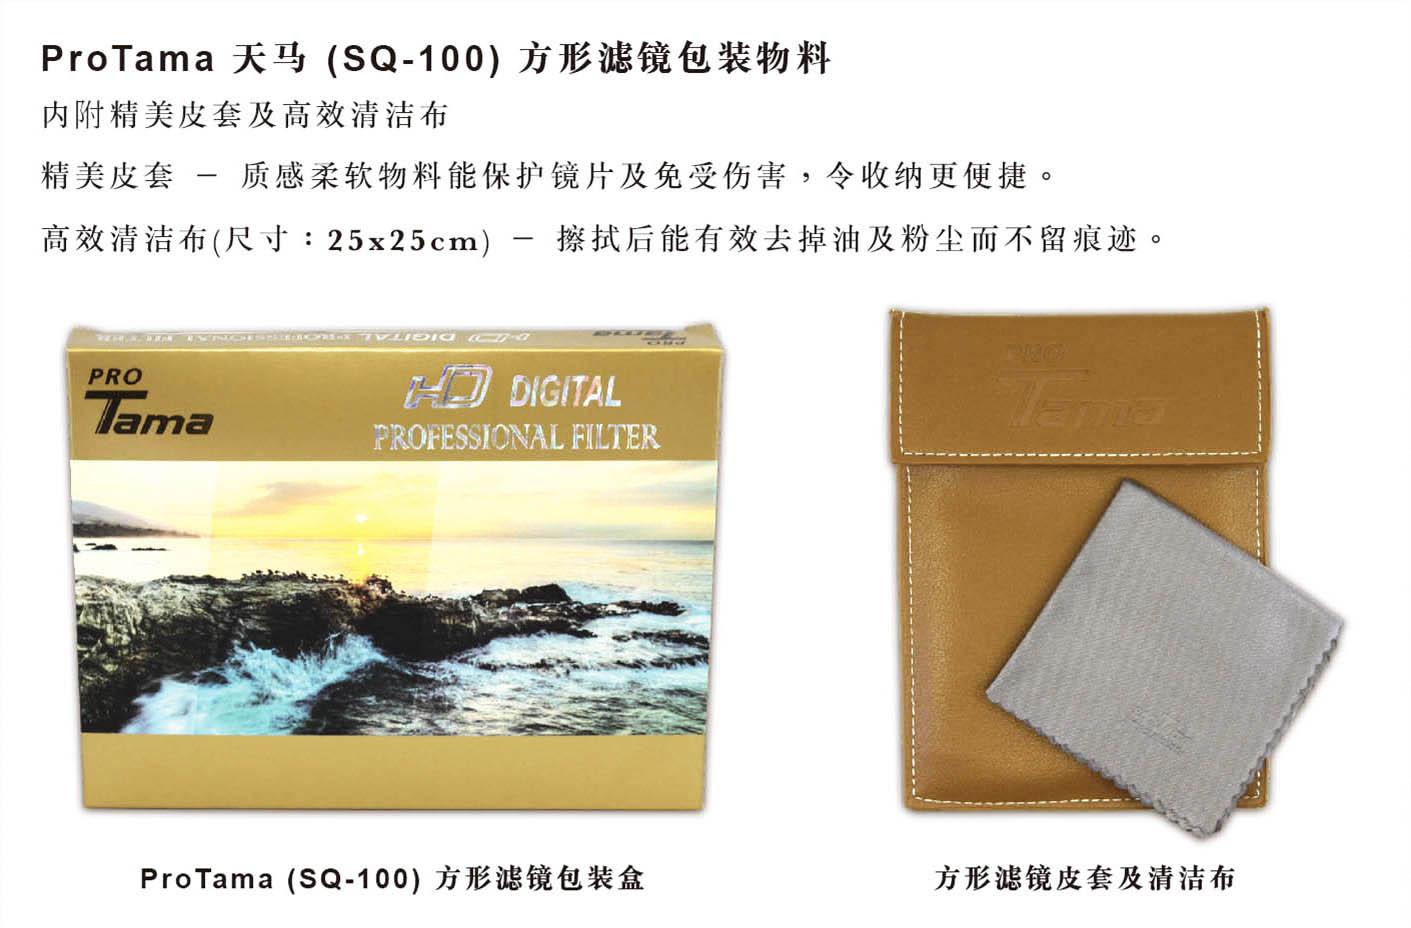 ProTama 天馬 (SQ-100) HD 高清方形濾鏡包裝盒 - 內附皮套及清潔布(25x25cm)